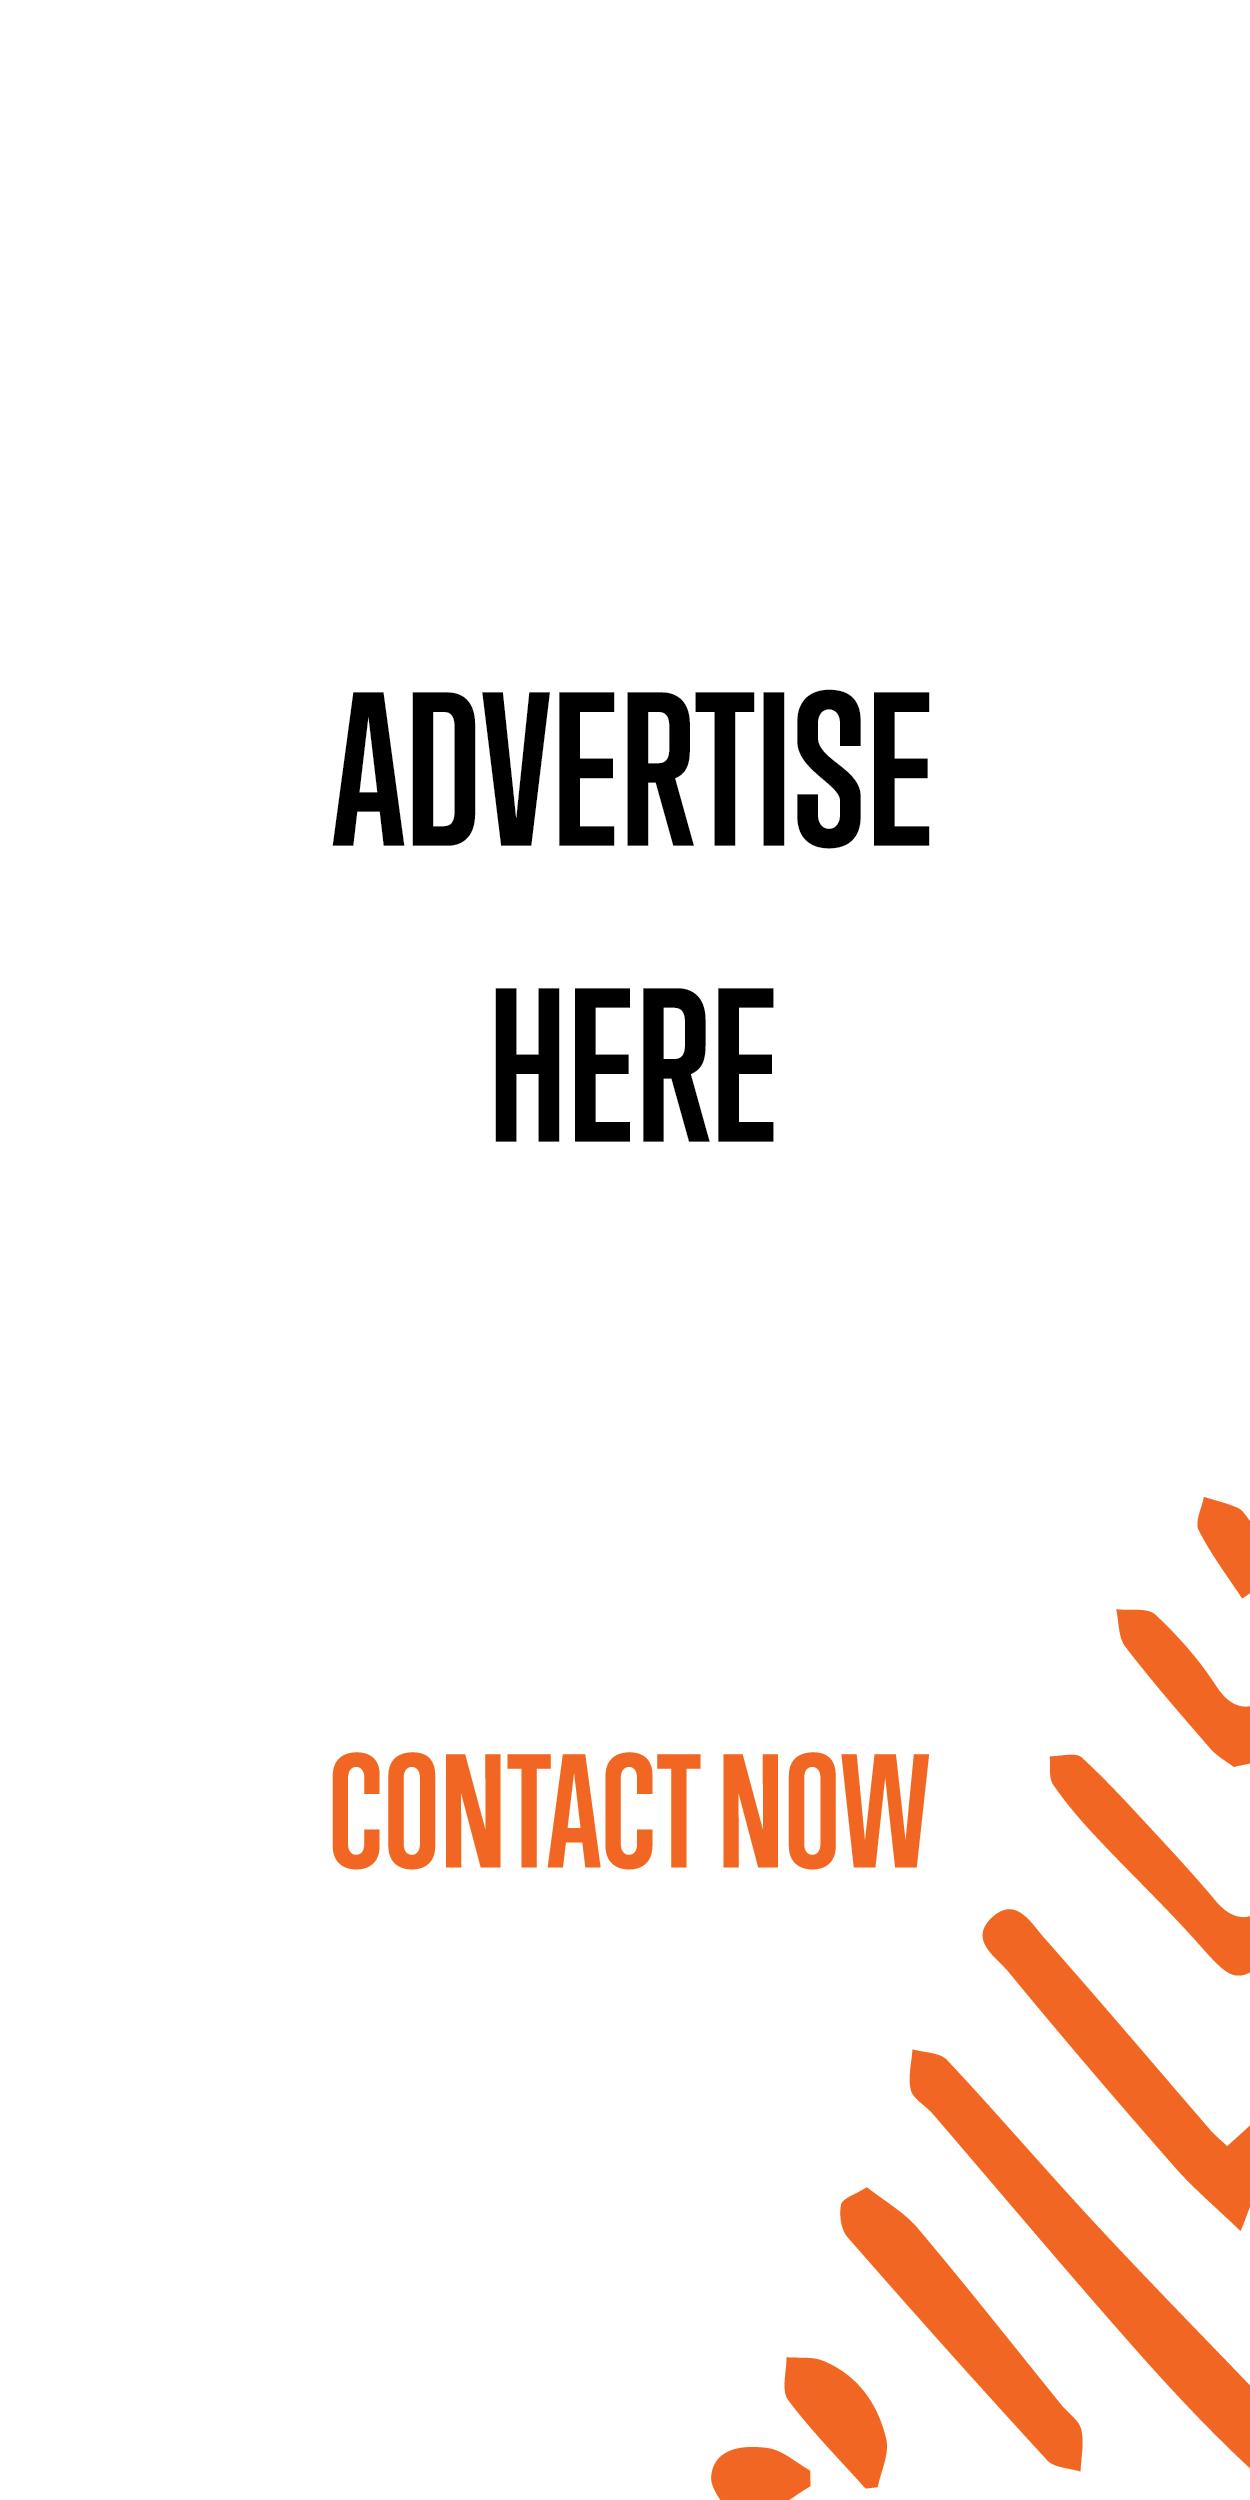 https://www.design233.com/contact-us